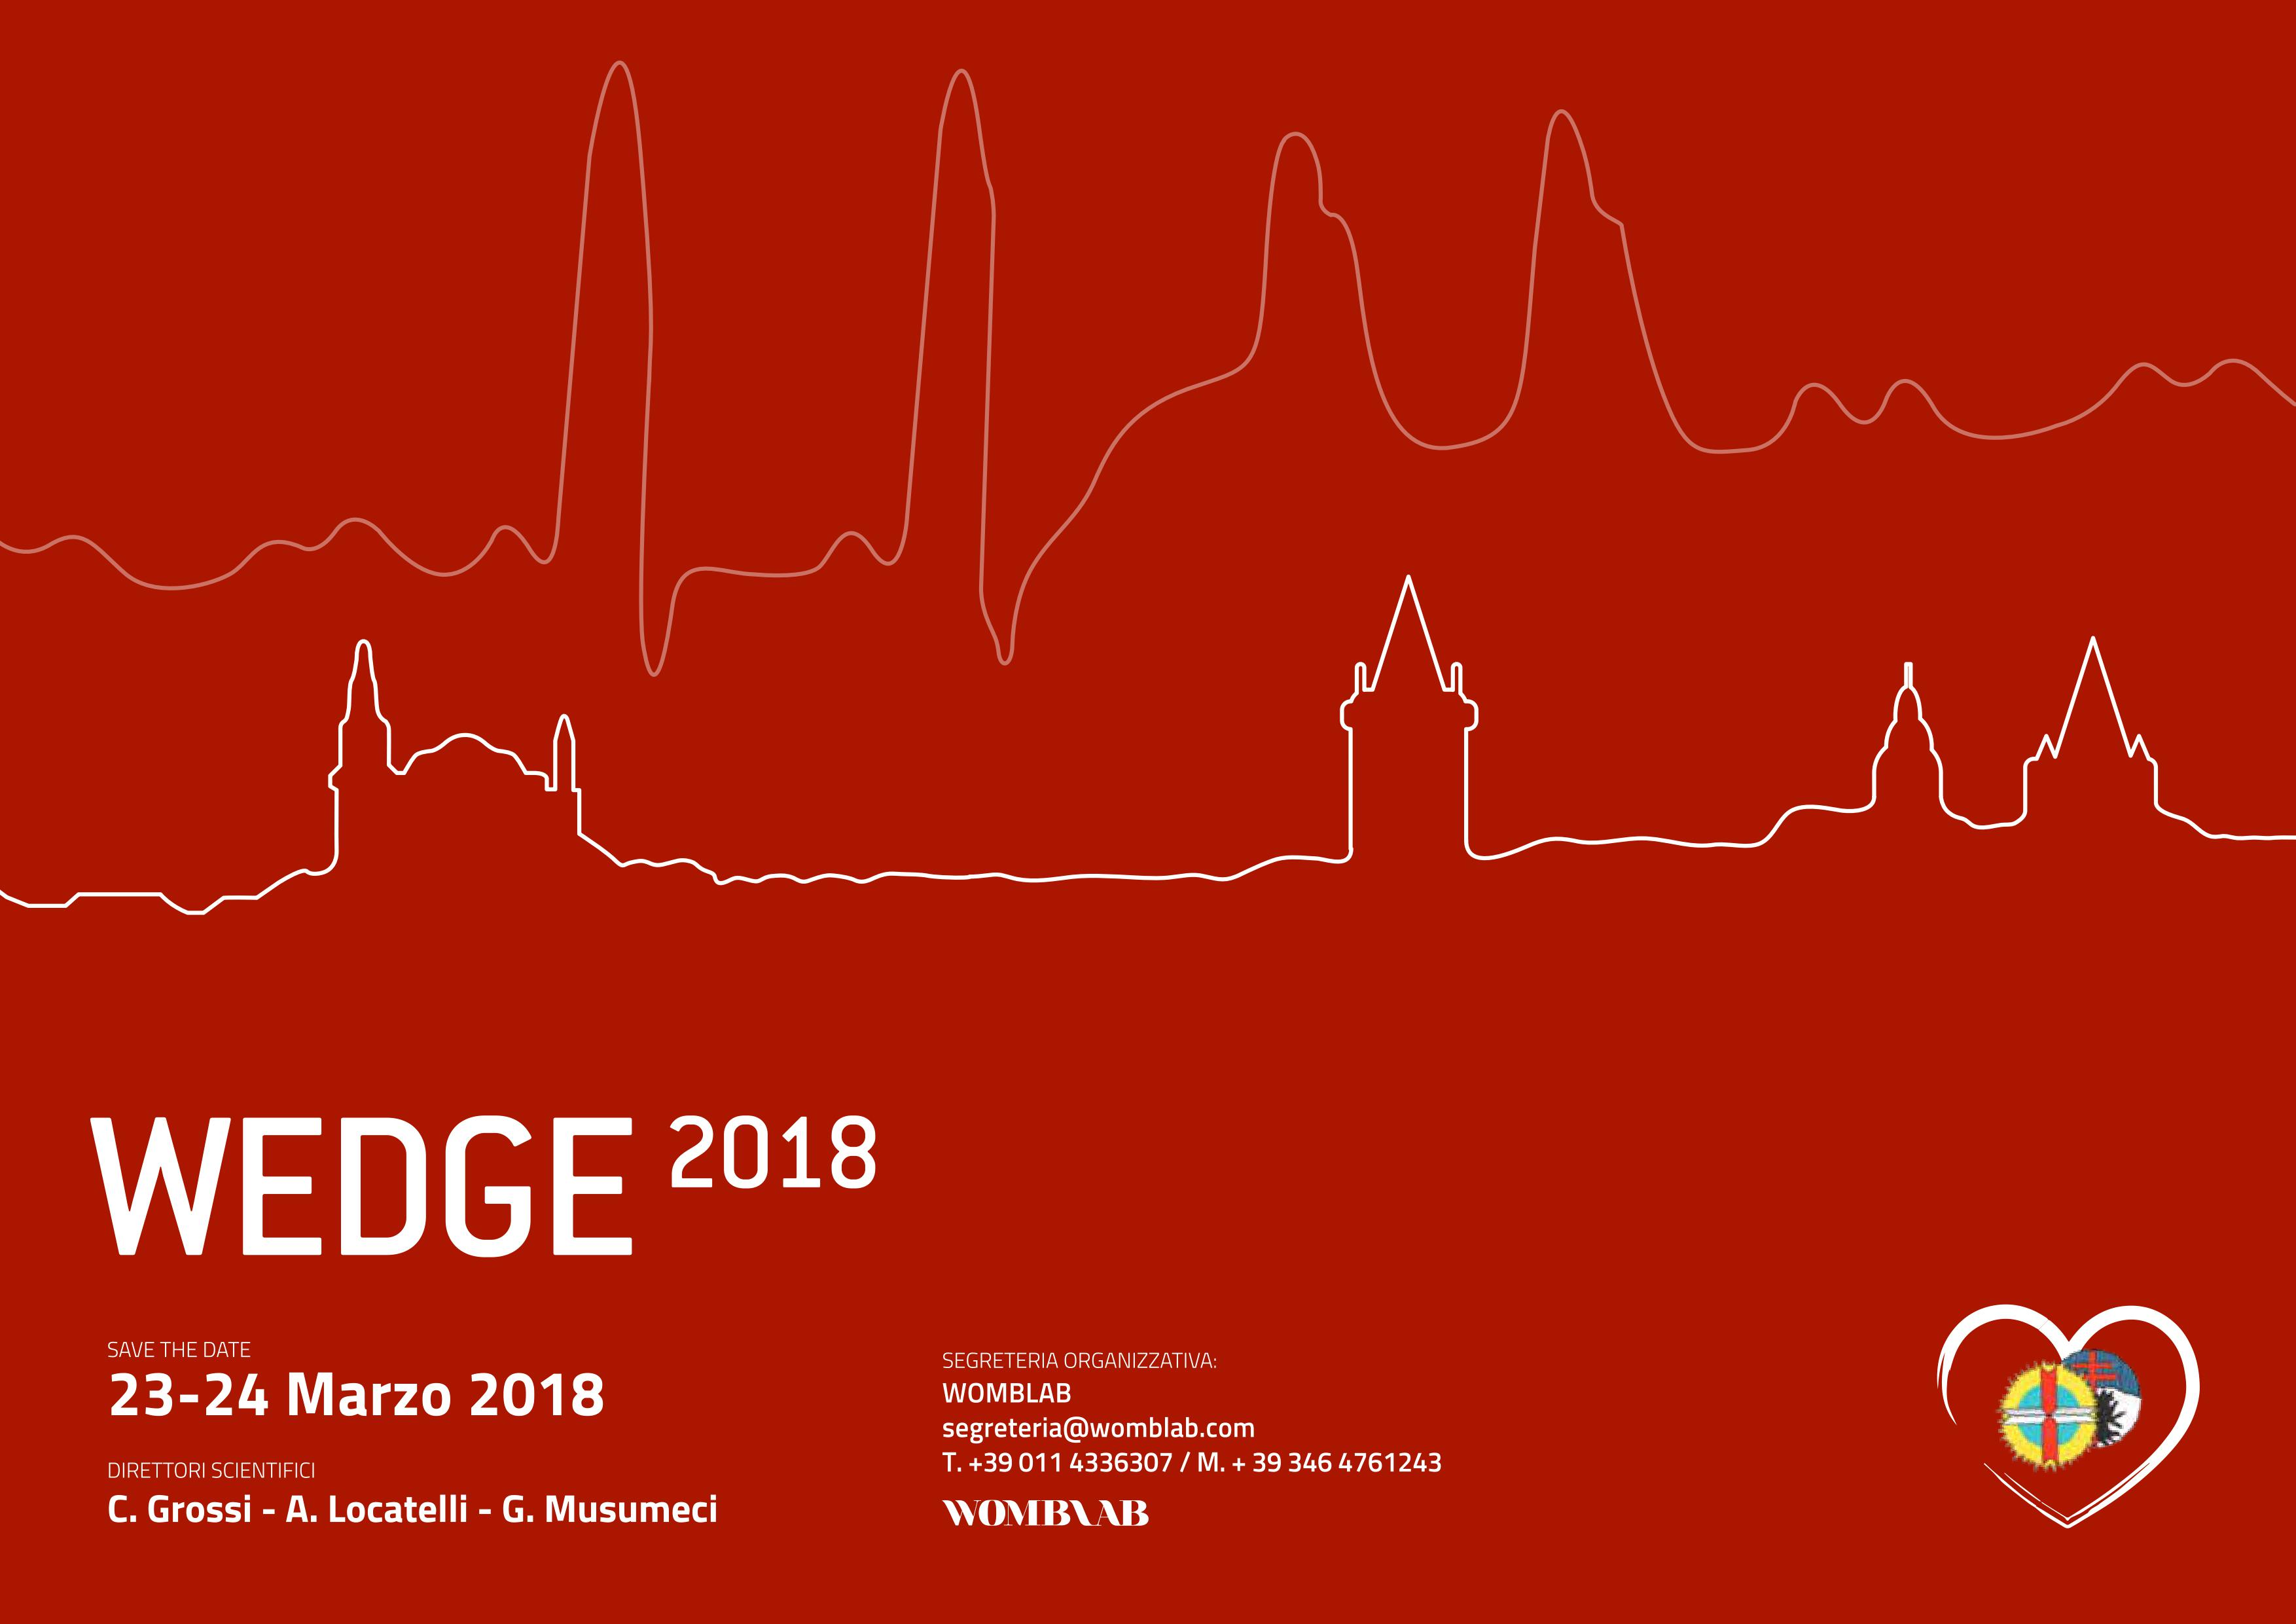 WEDGE_2018